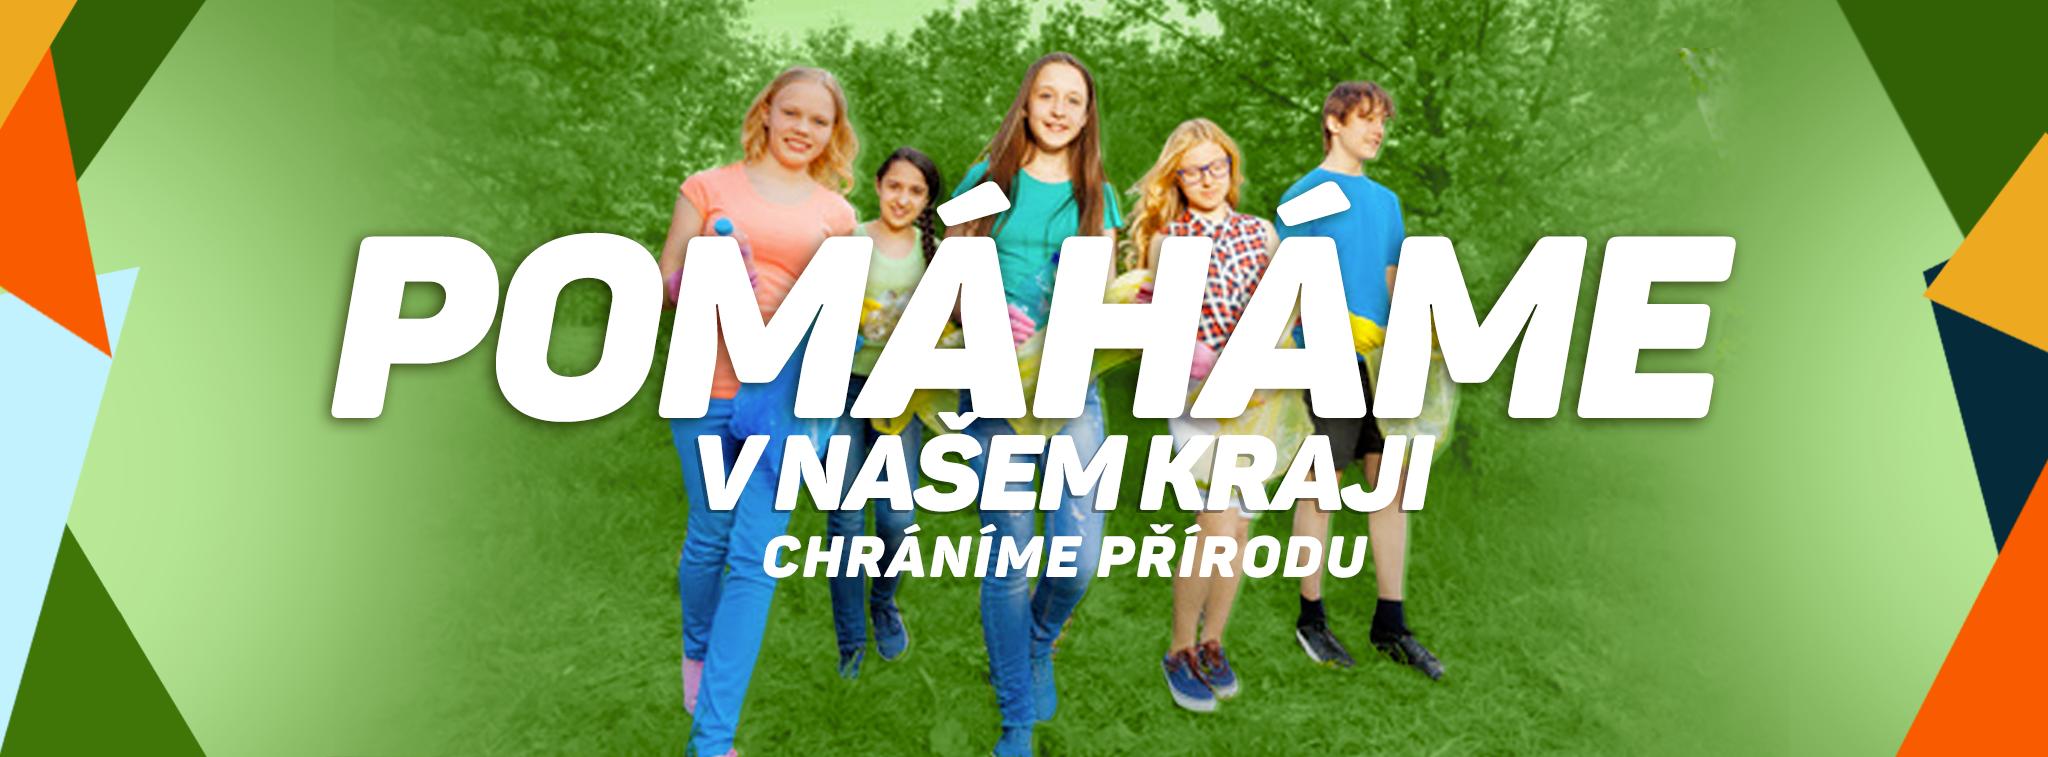 pomahame_clanek